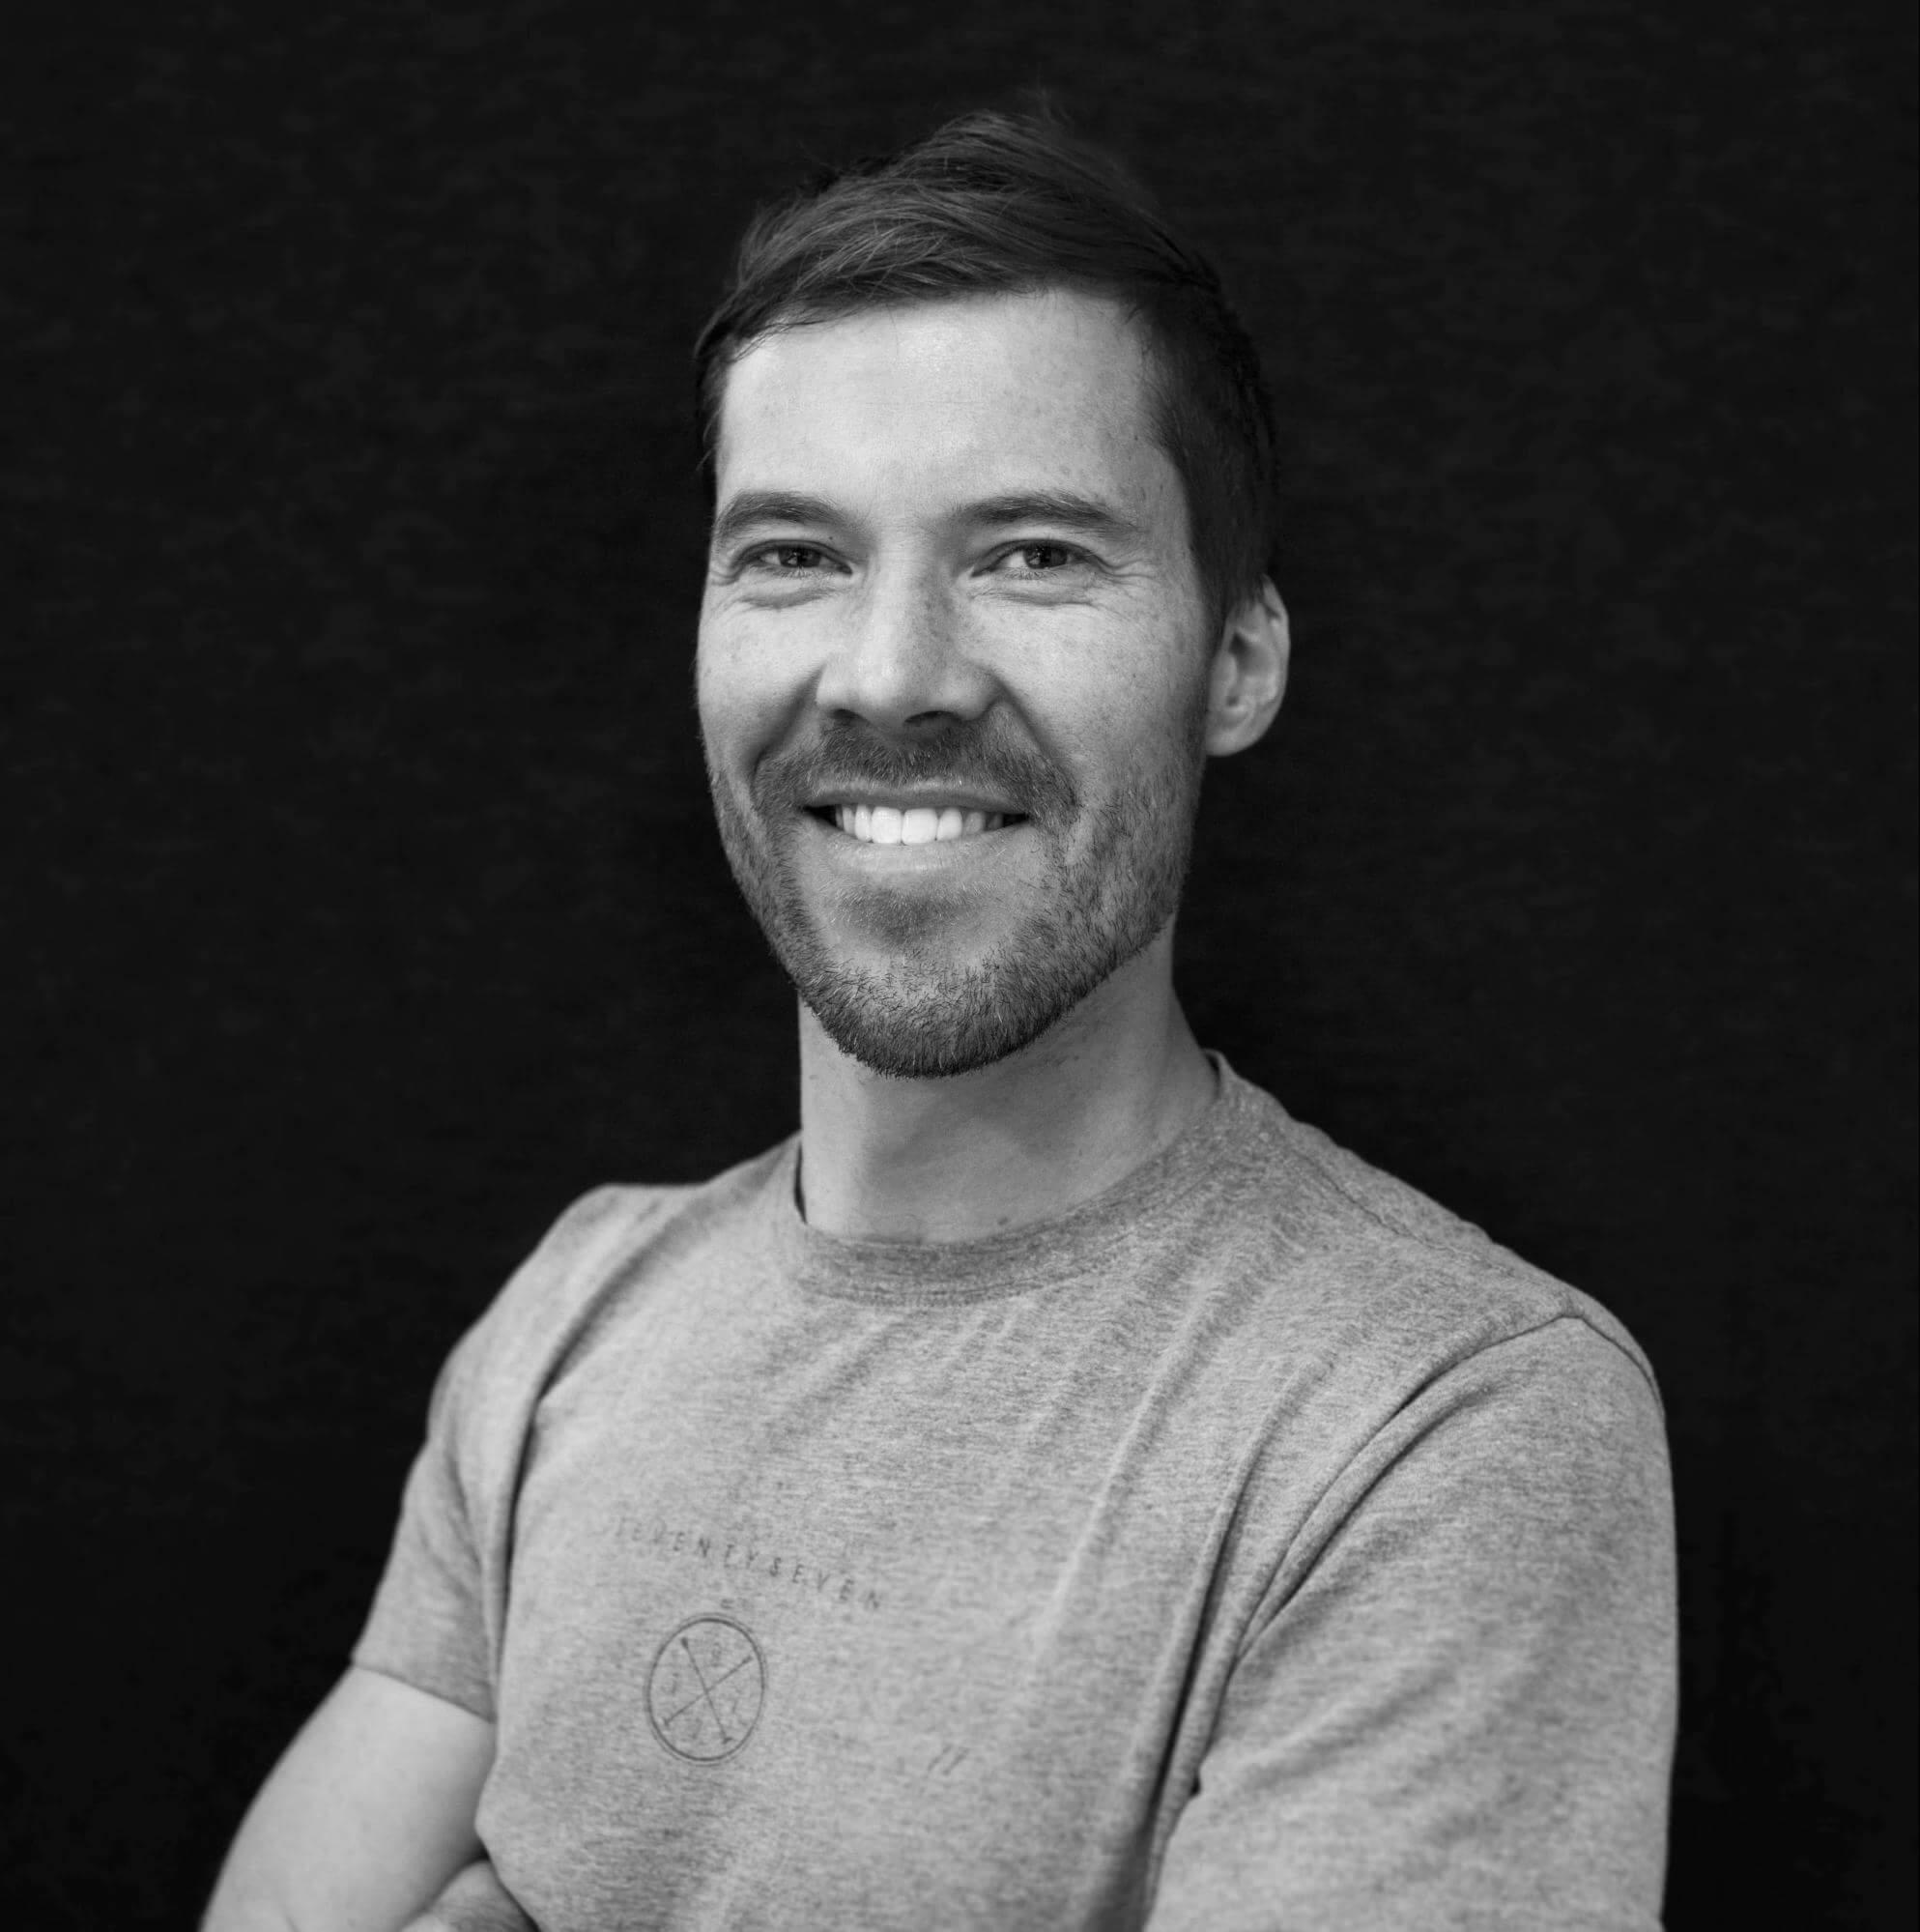 Andrew Wight, Associate Creative Director at SapientNitro